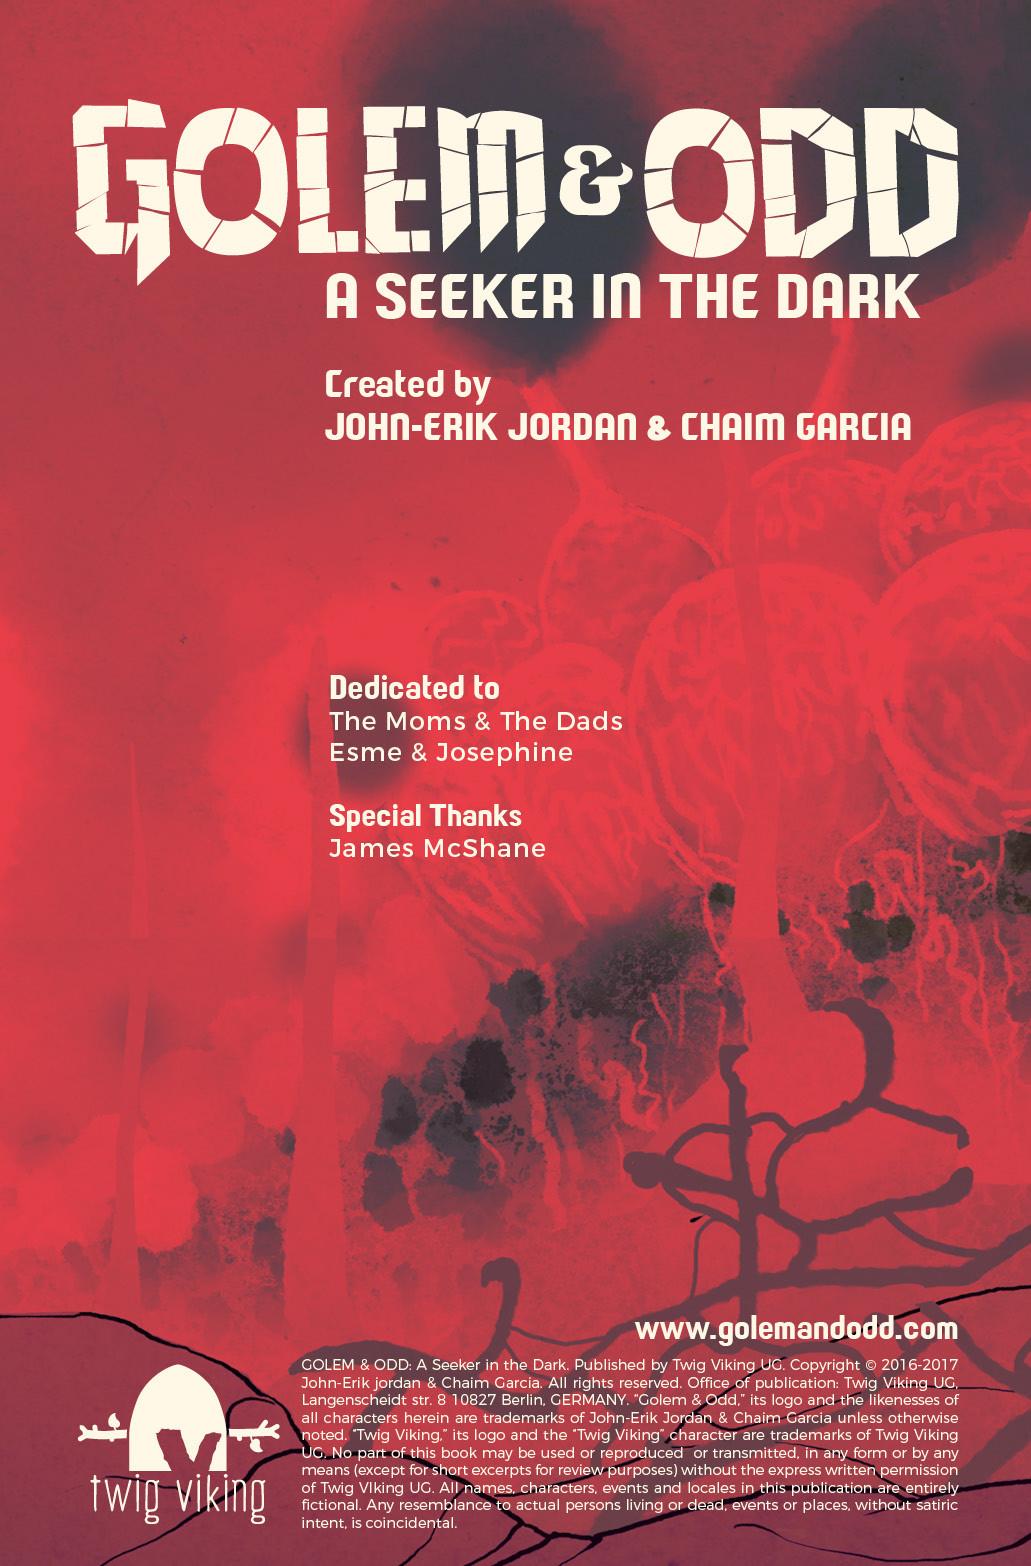 Chaim garcia golem and odd a seeker in the dark3